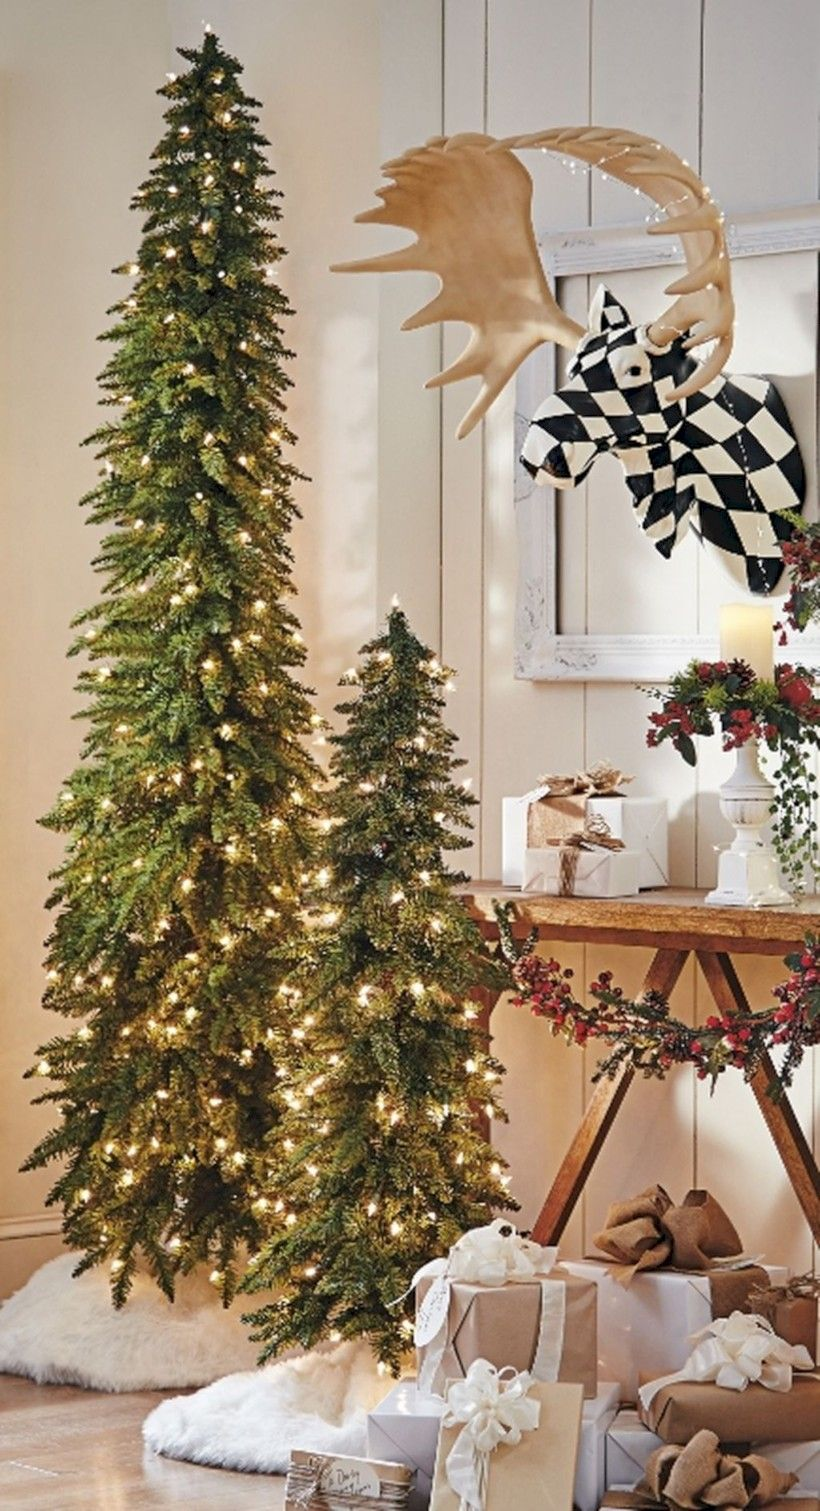 43 Totally Inspiring Small Christmas Tree Decoration Ideas For Space Saving Roundecor Skinny Christmas Tree Small Christmas Trees Decorated Slim Christmas Tree